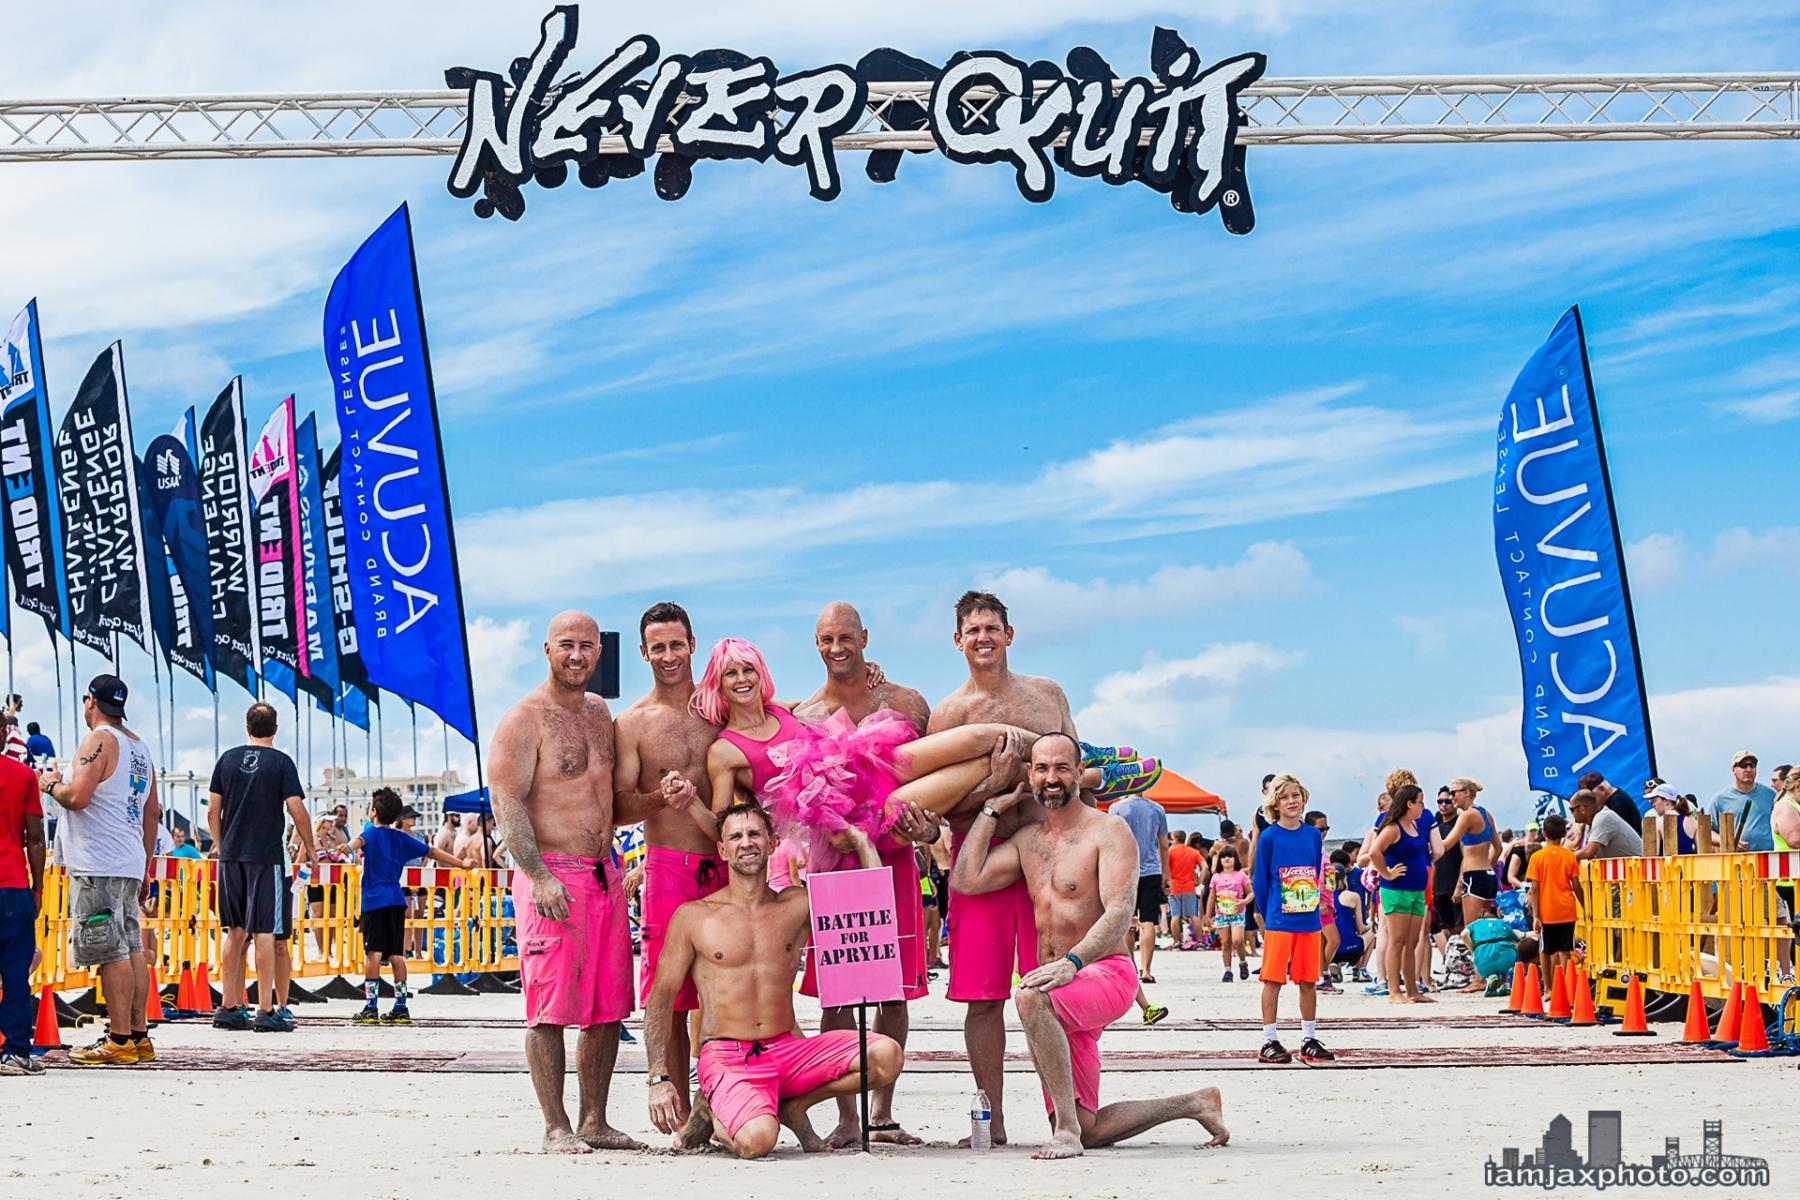 Battle for Beach, Apryle - Never Quit